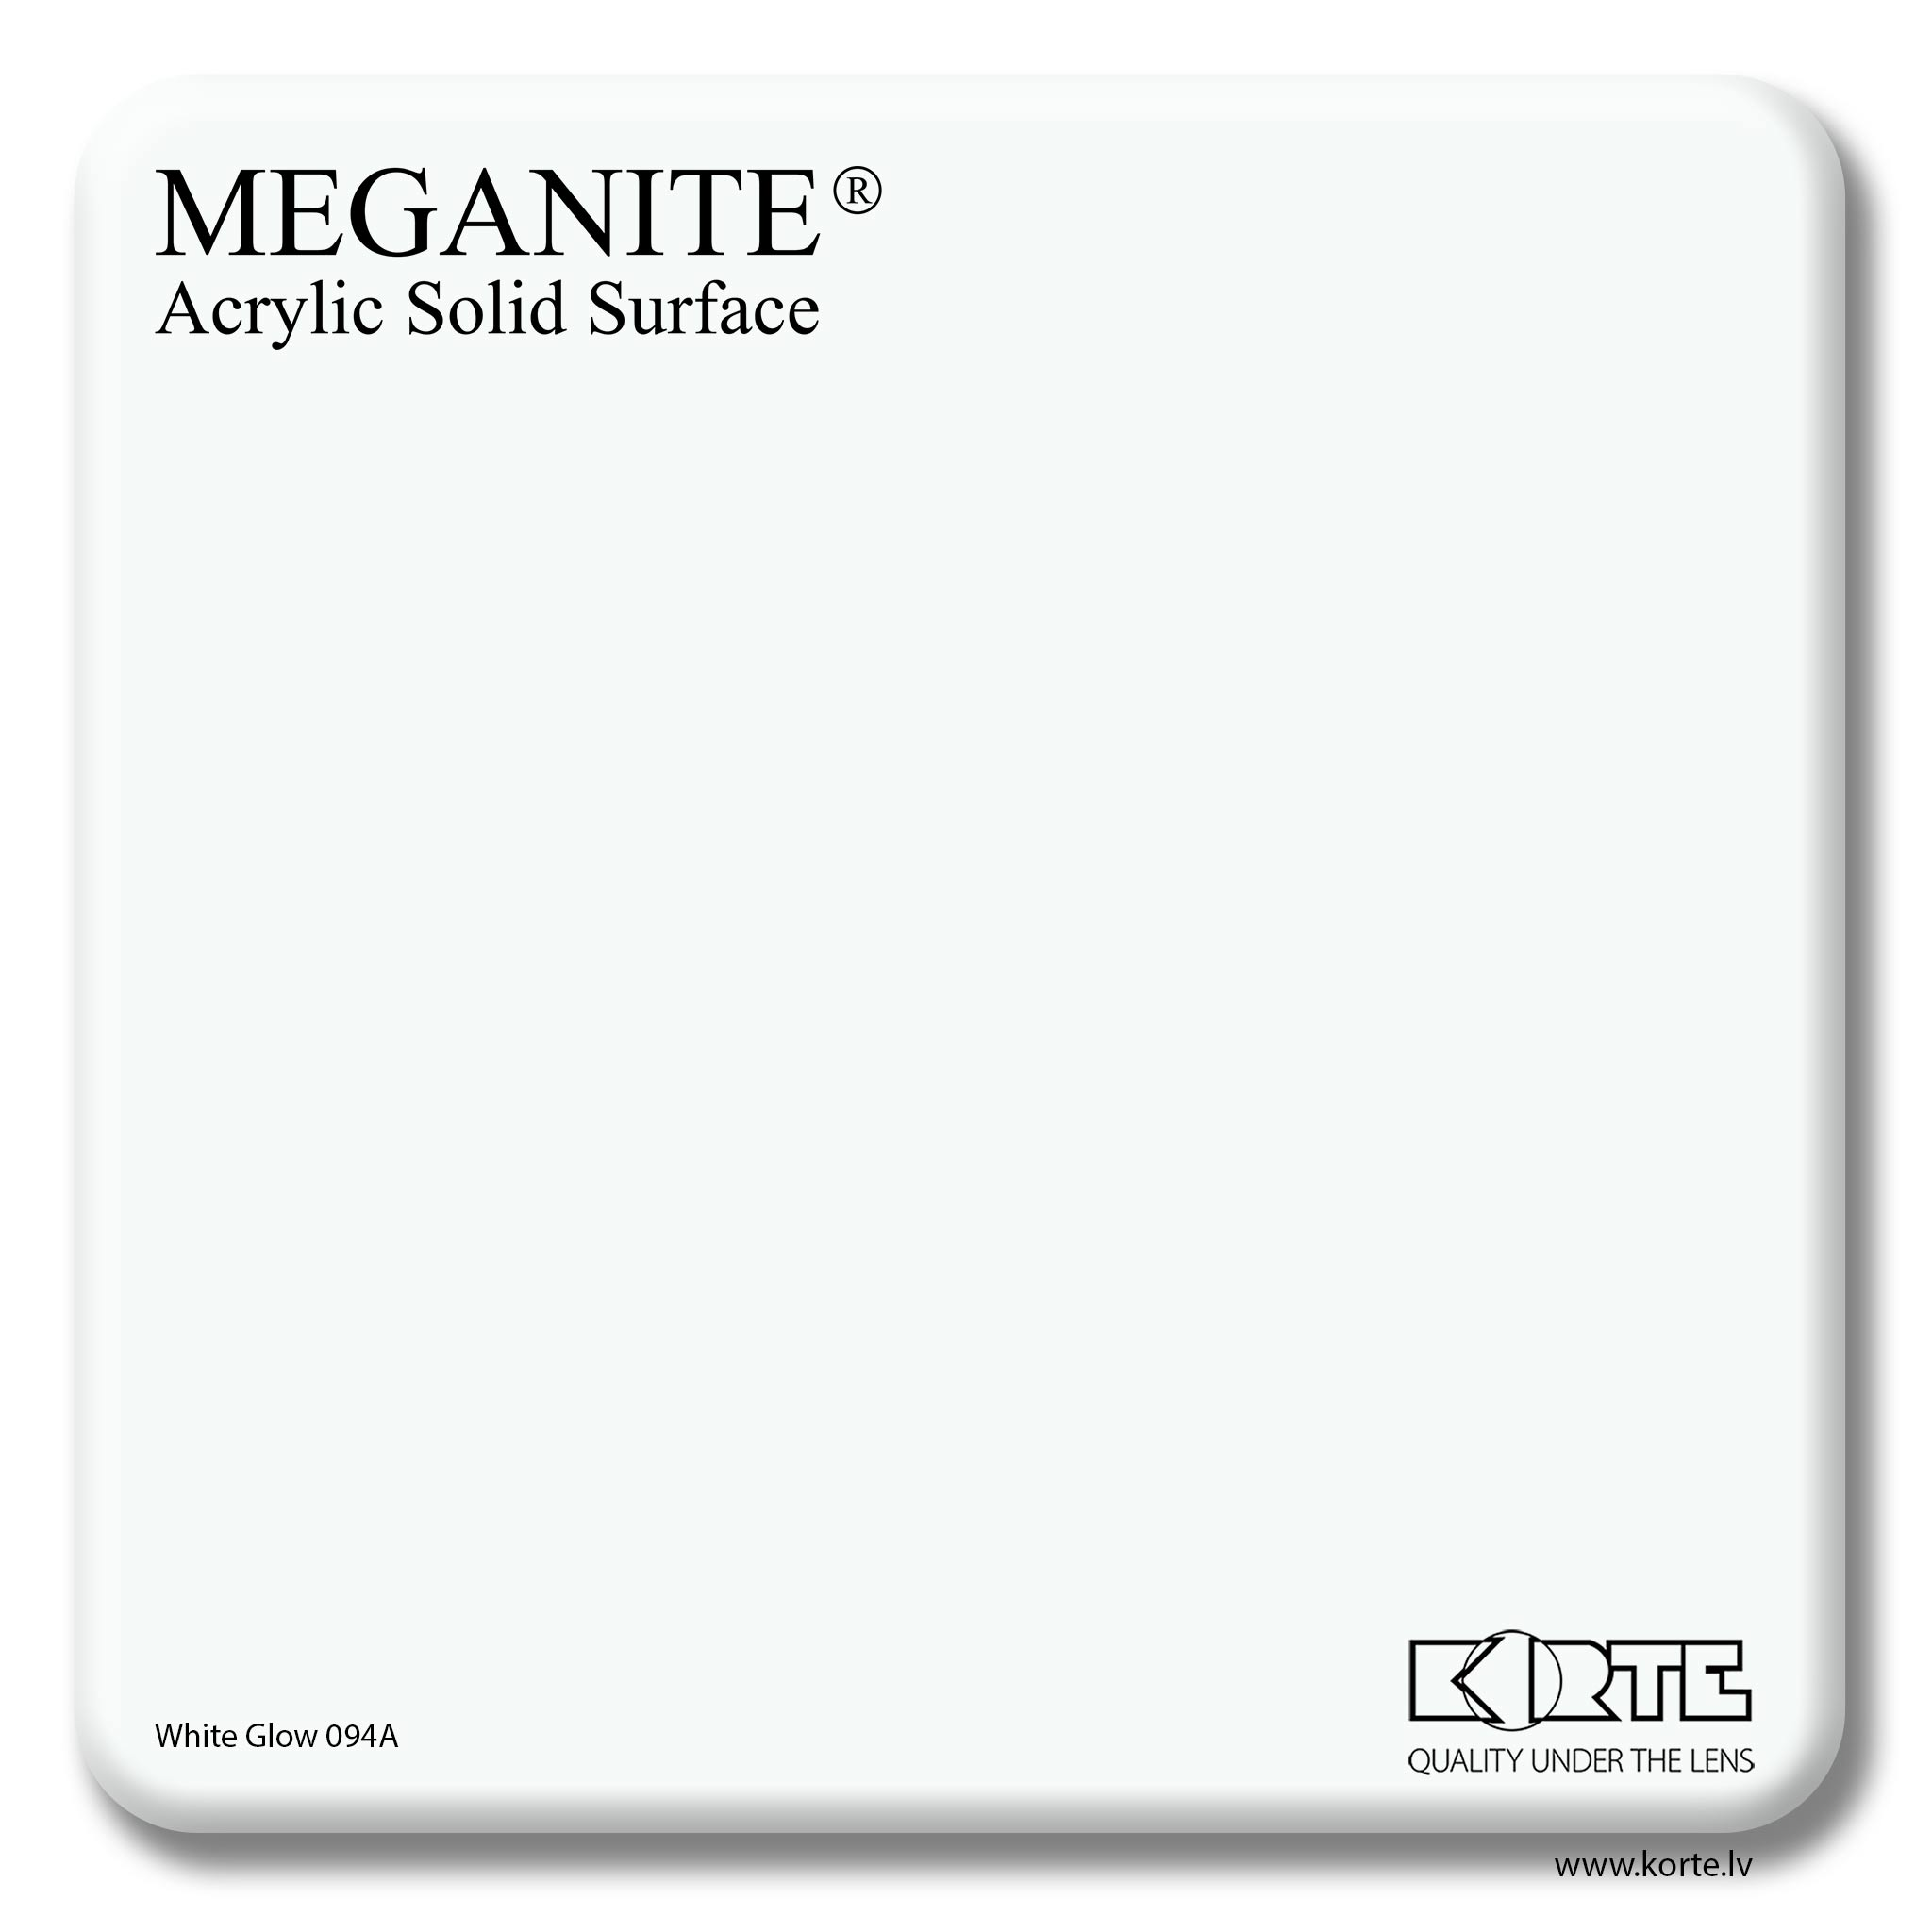 Meganite White Glow 094A